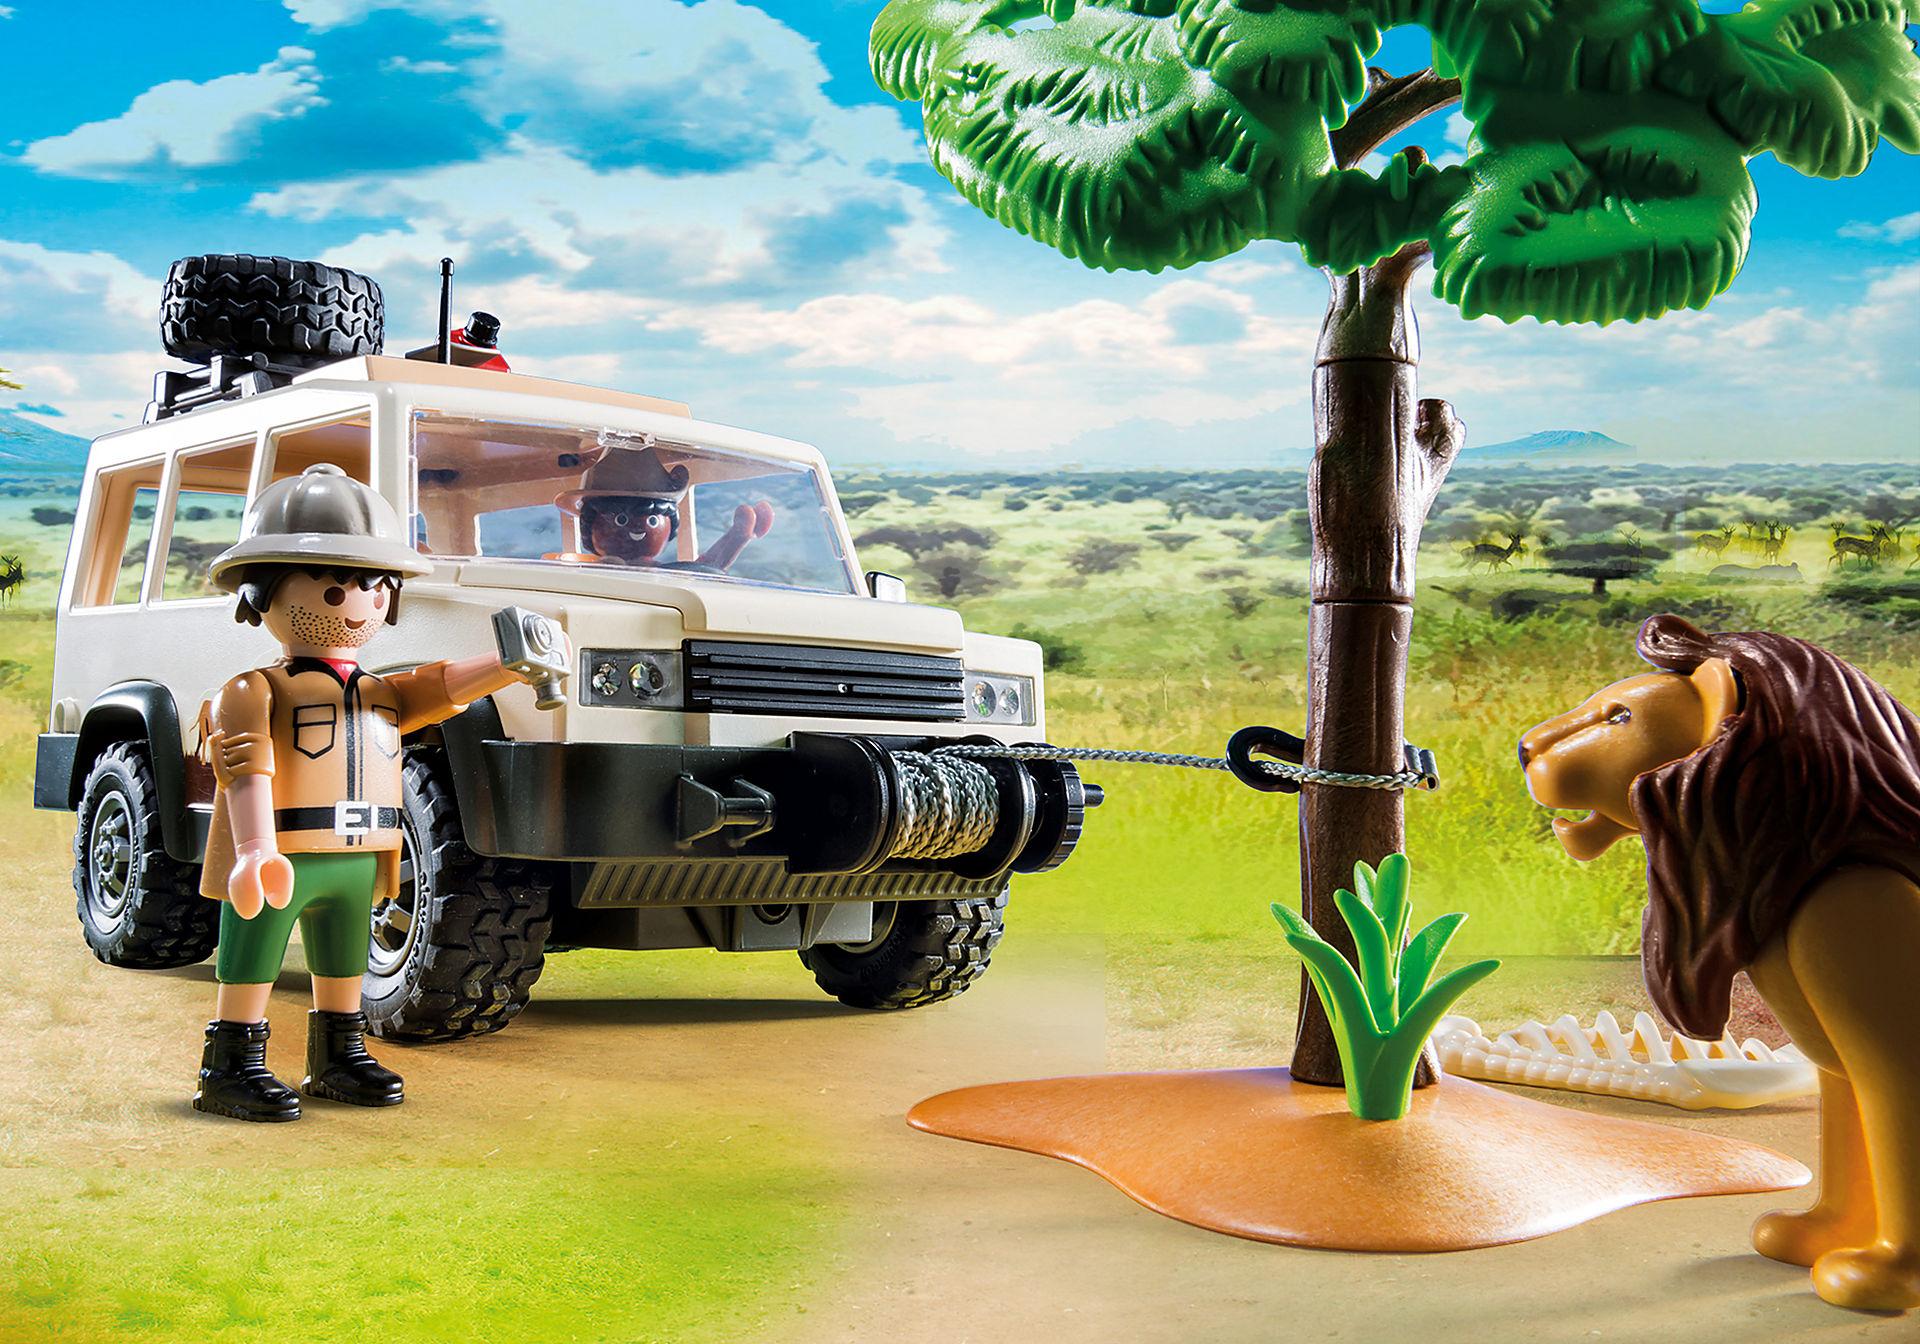 http://media.playmobil.com/i/playmobil/6798_product_extra1/Aventuriers avec 4x4 et couple de lions